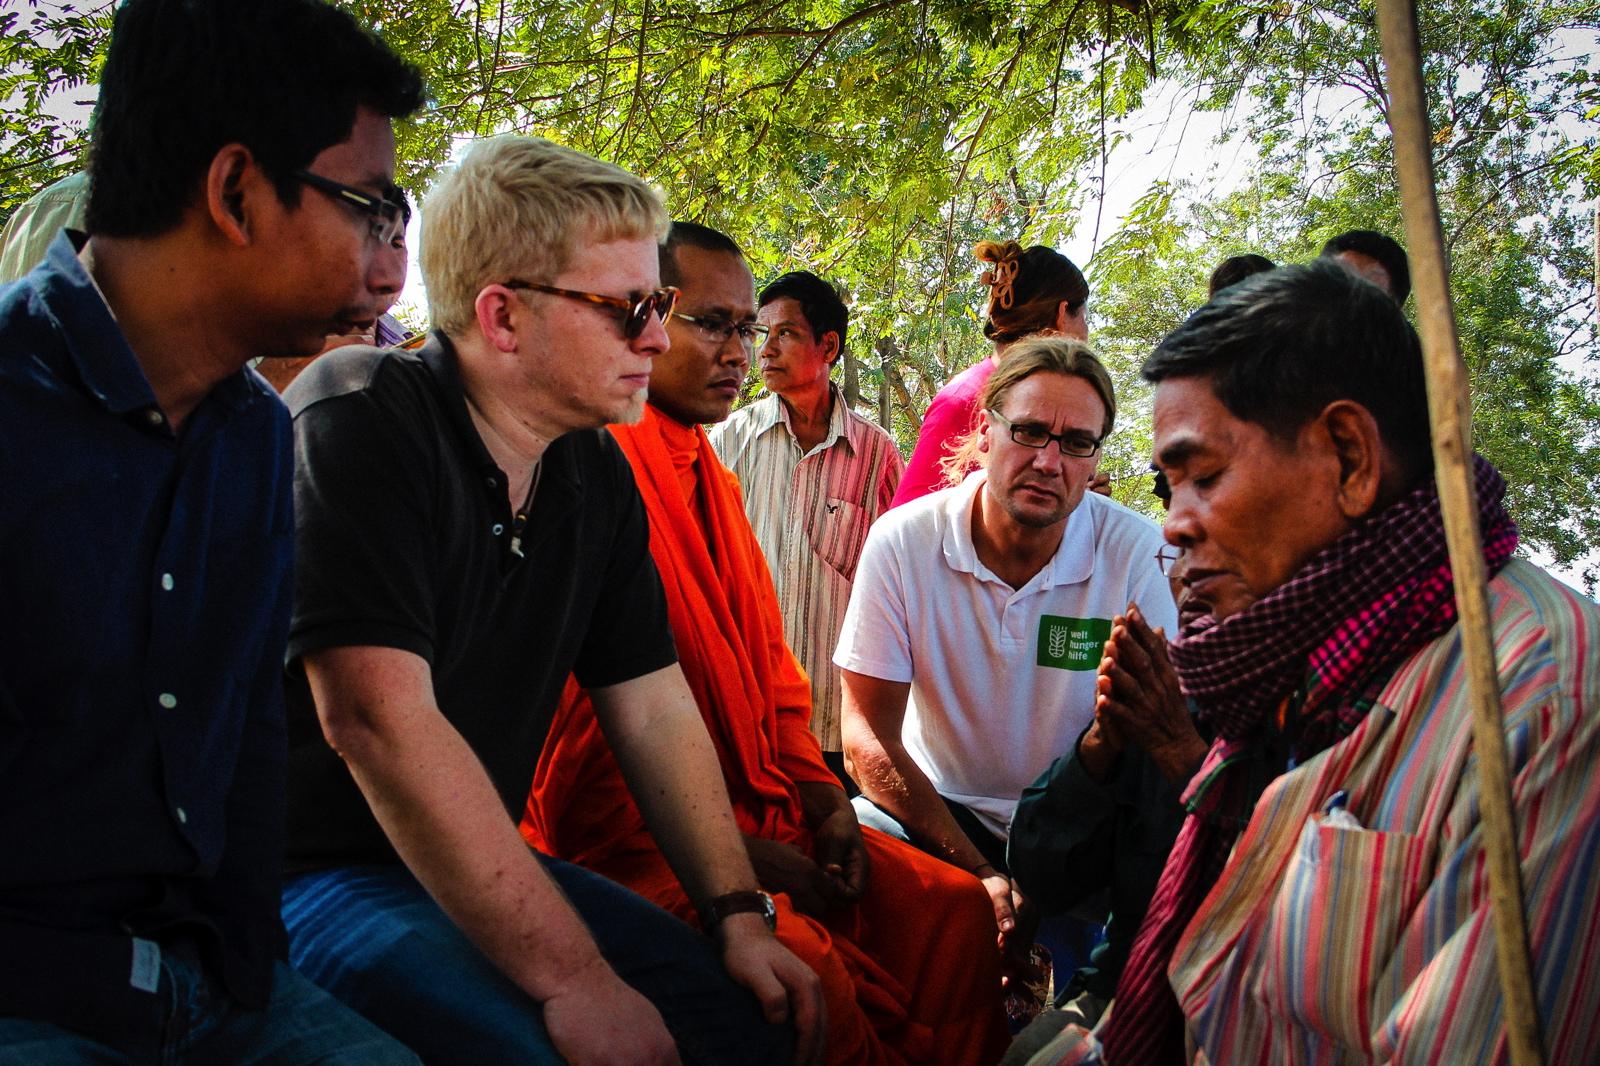 Recherche zu Land Grabbing in Kambodscha, NachDenkSeiten